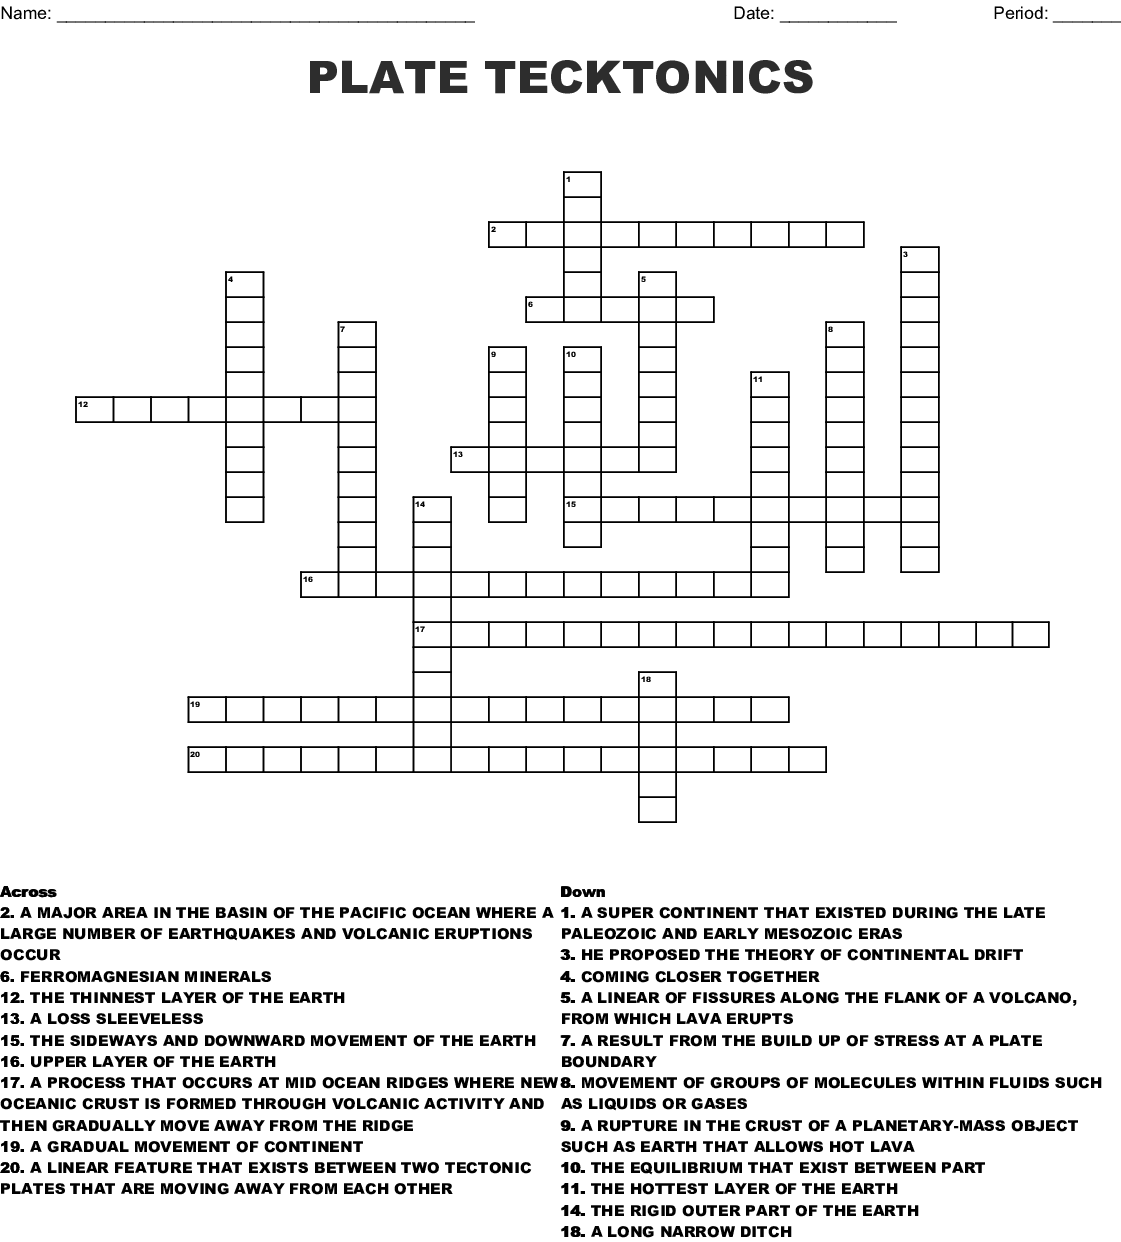 Plate Tecktonics Crossword